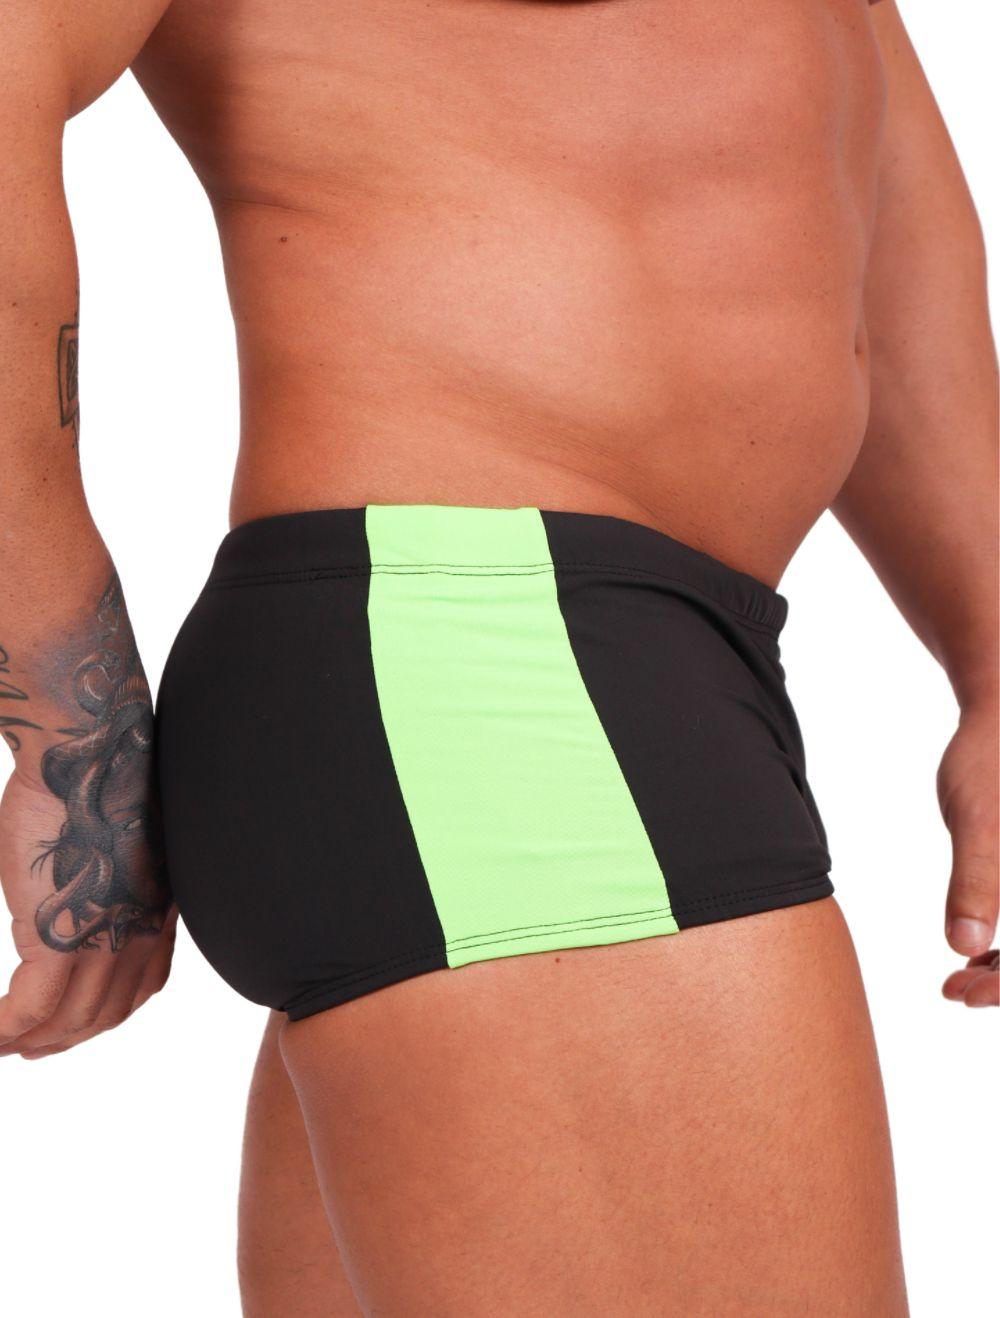 Sunga Masculina Preta com Faixa Lateral Verde Neon